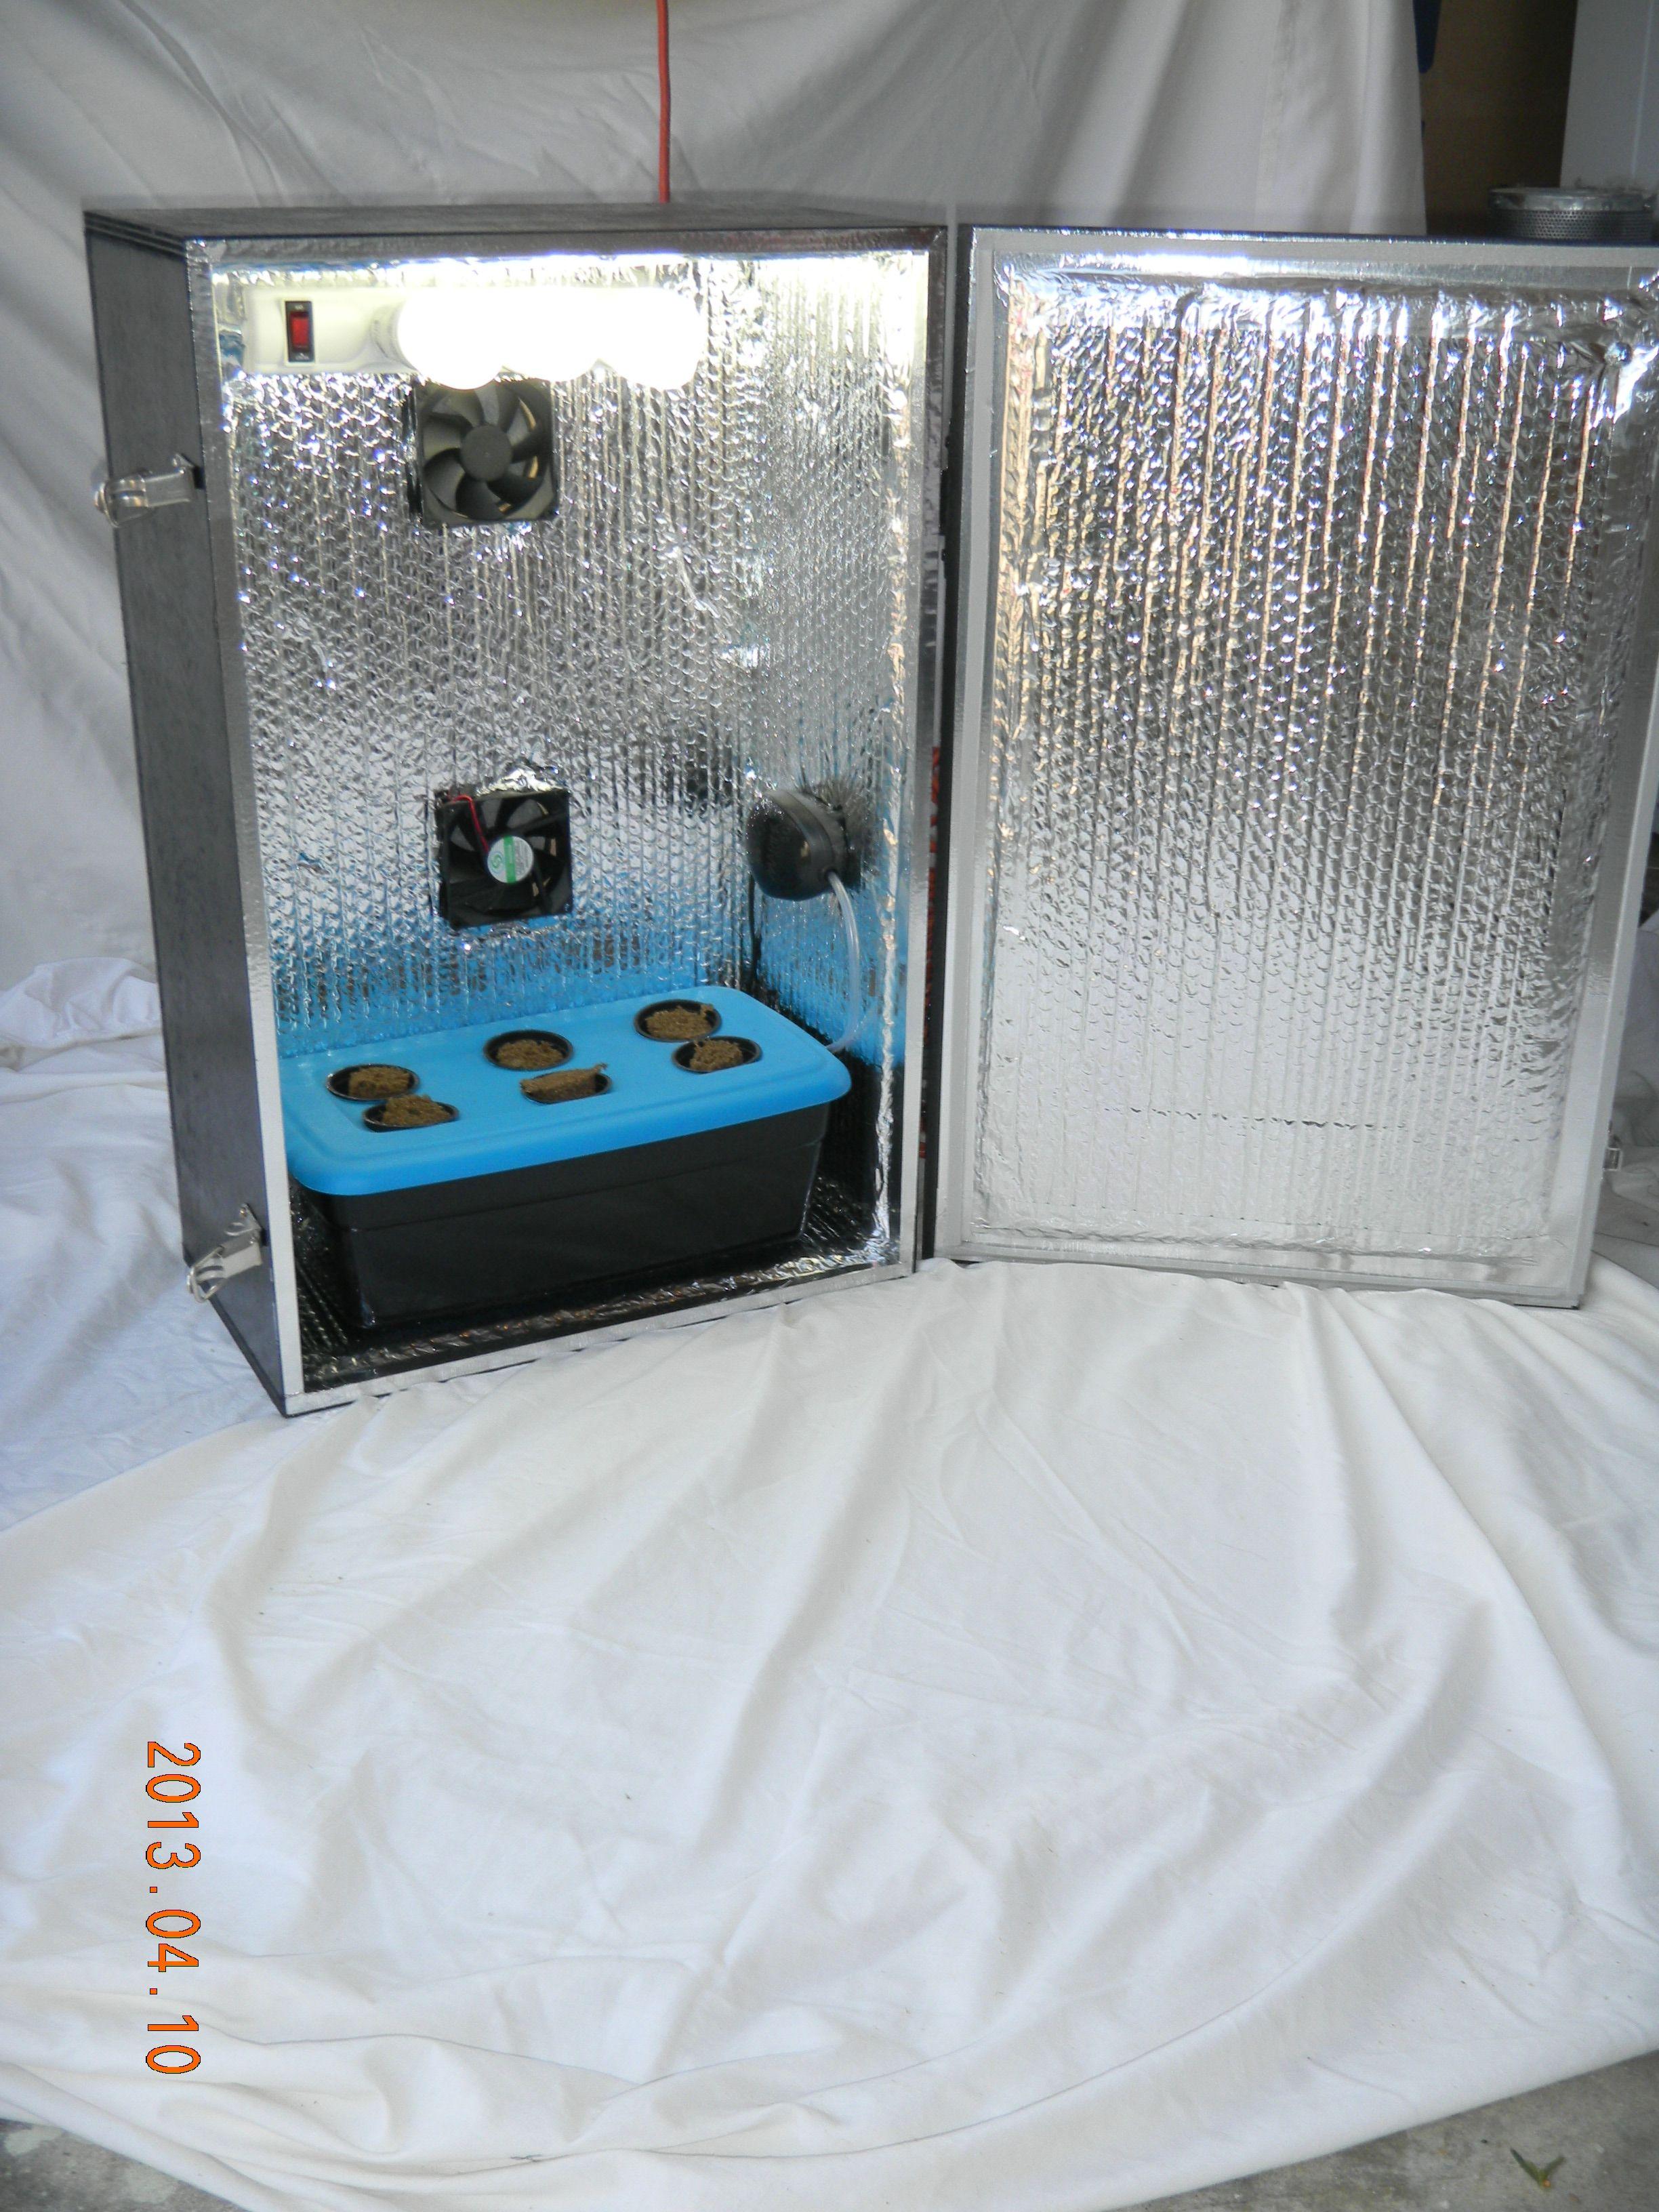 Lowryder Stealth Hydroponic Grow Box